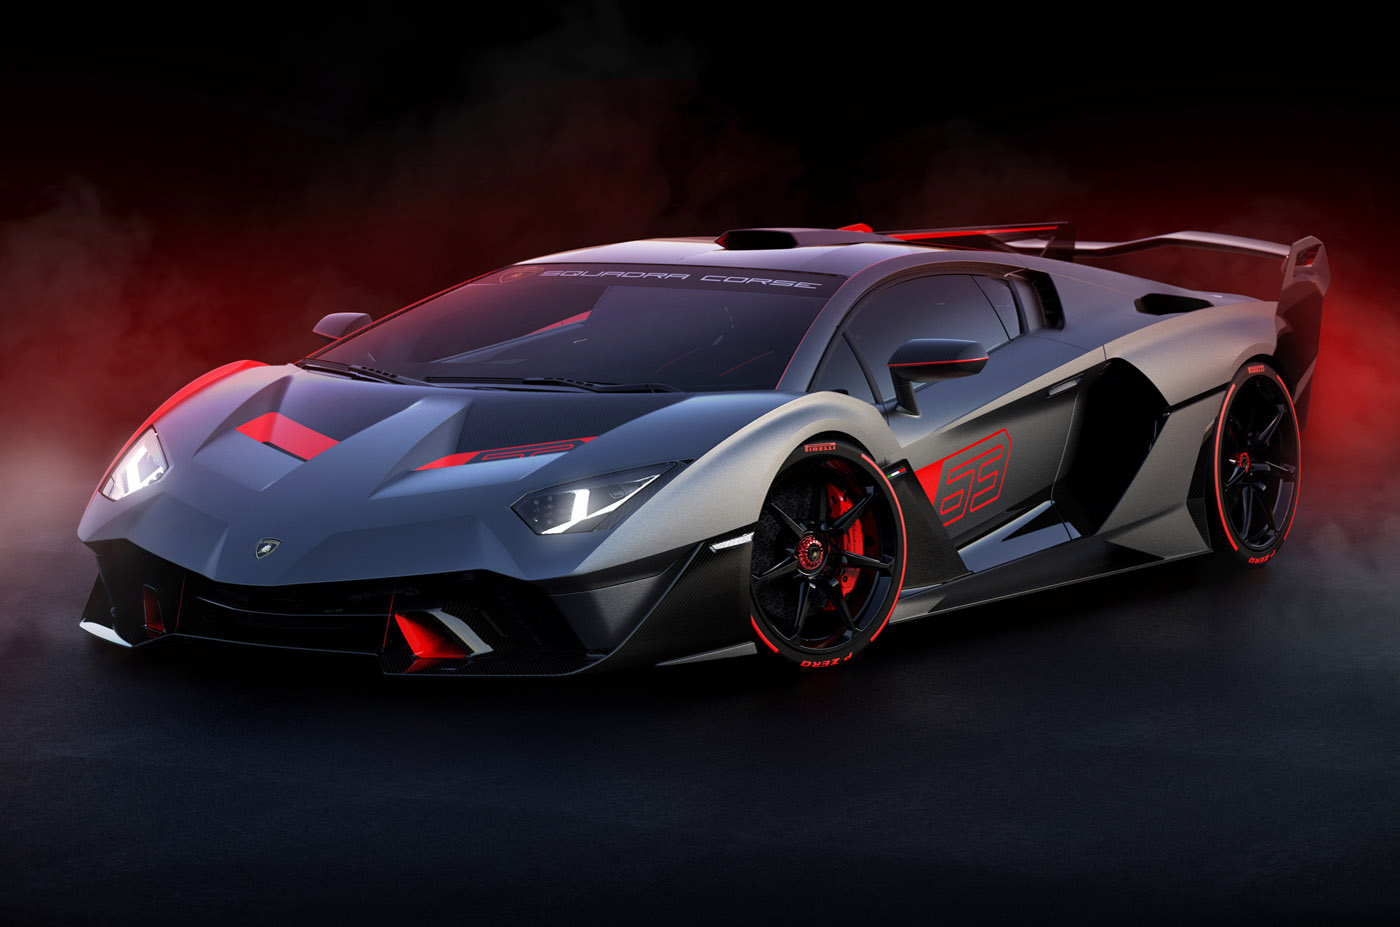 Lamborghini SC18 Alston, strona o motoryzacji